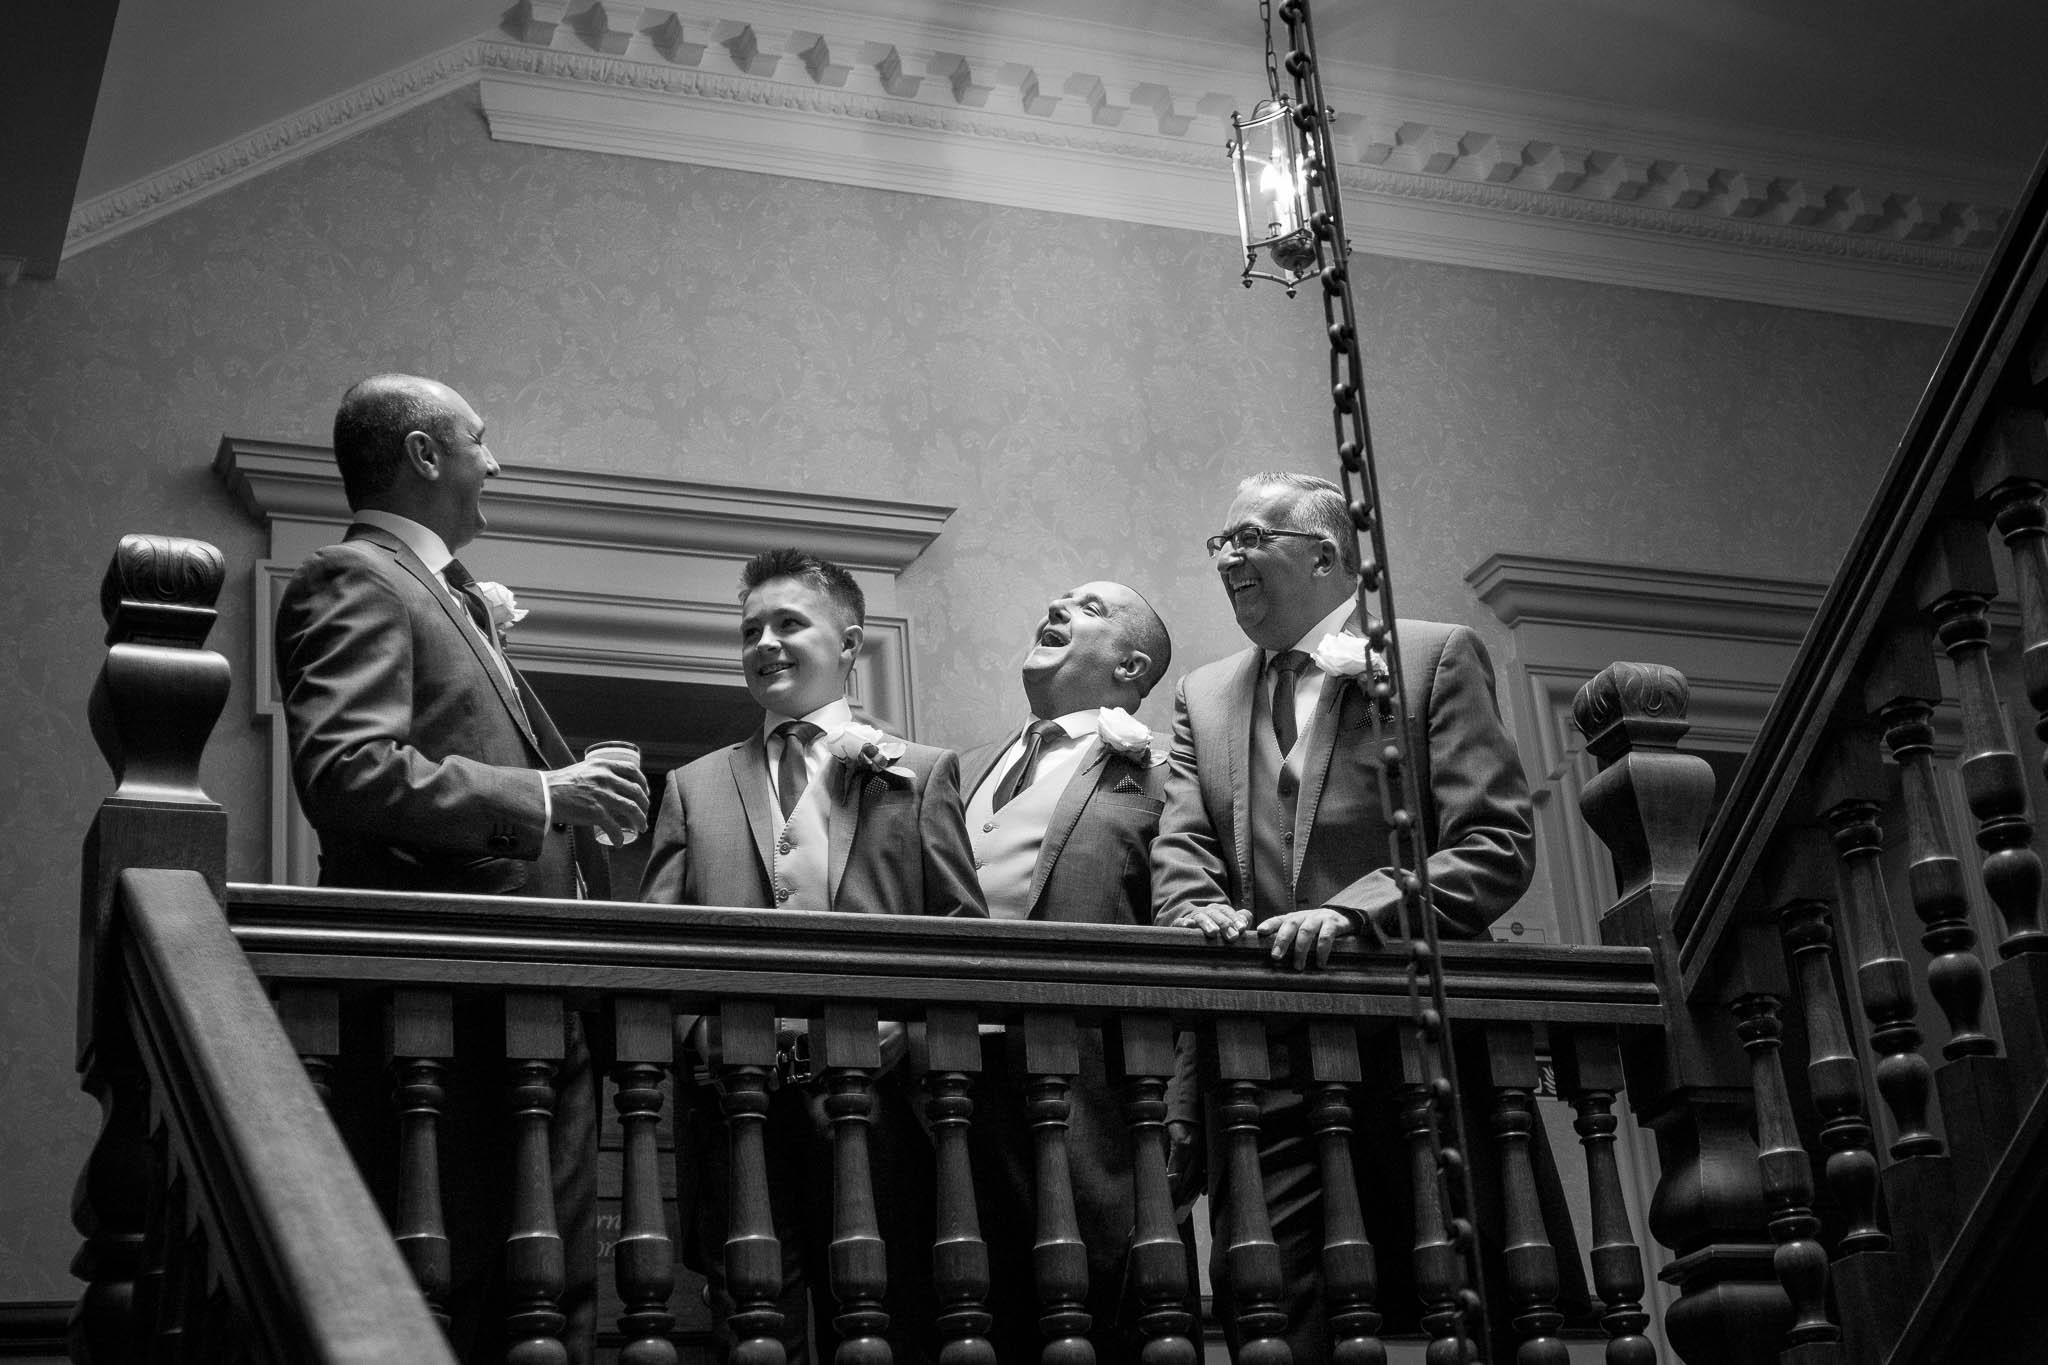 Crathorne Hall Hotel Wedding Photographer35.jpg